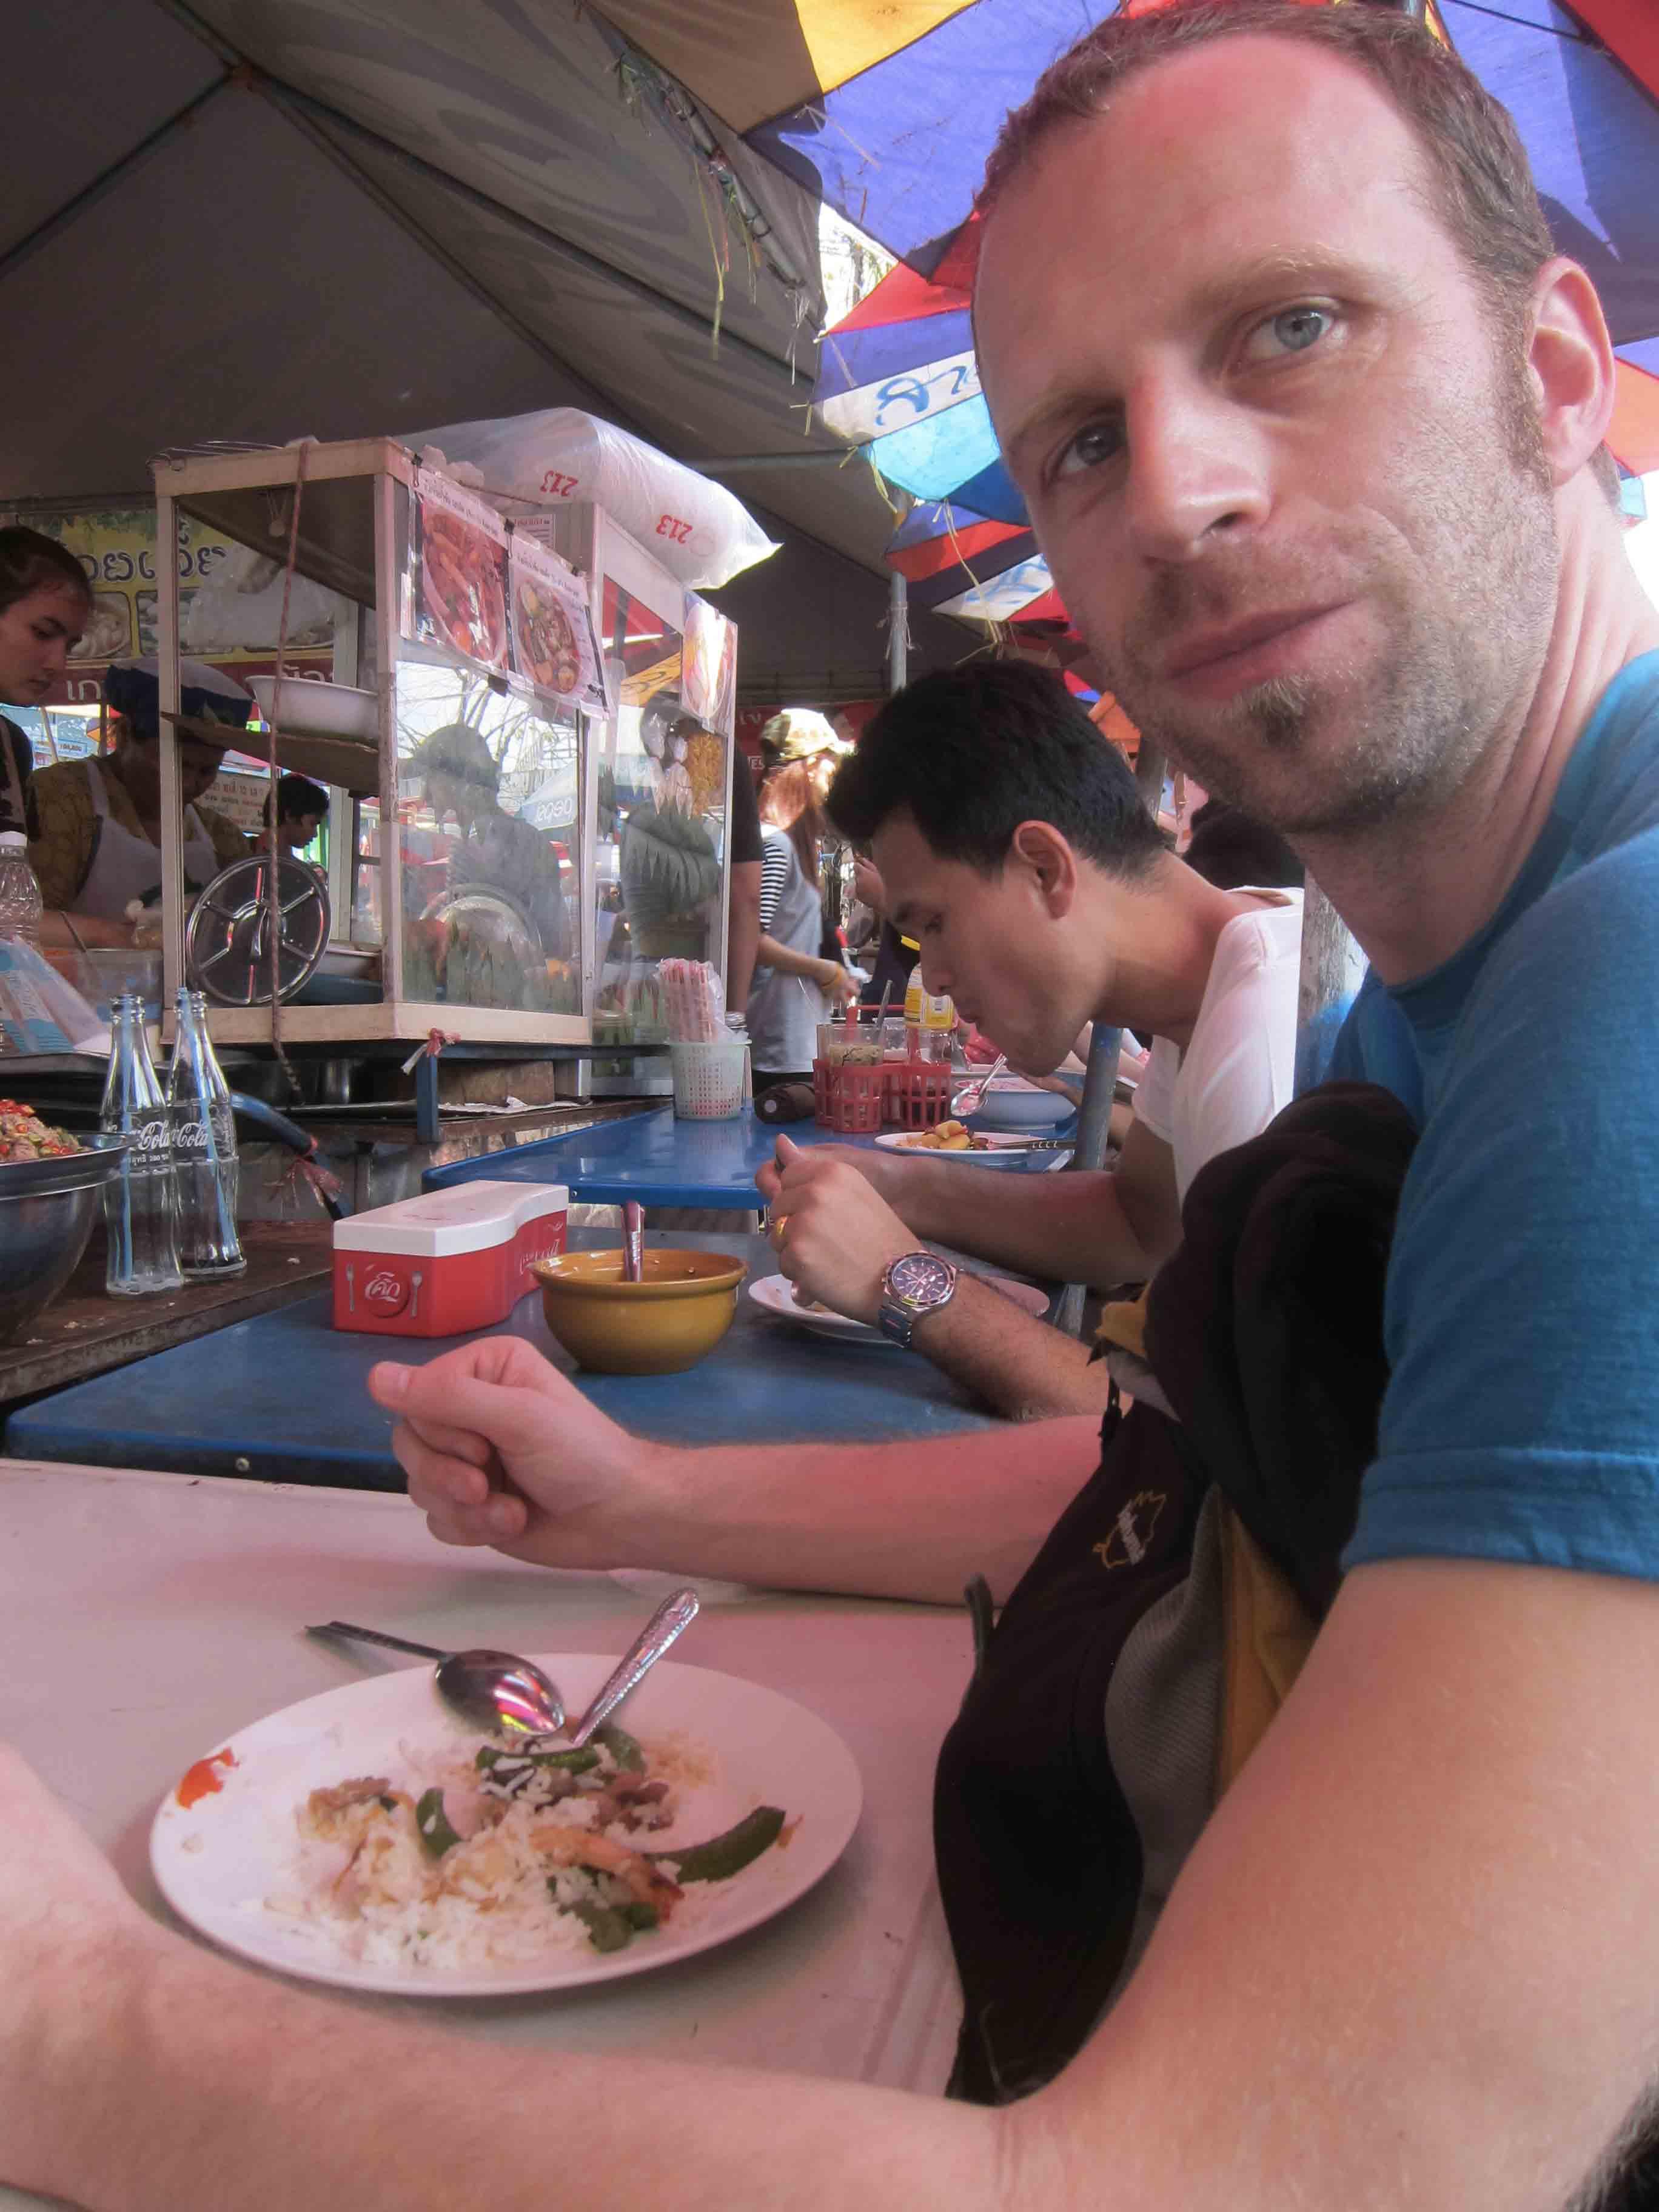 Dejeuner-au-marche-de-Chatuchak-Bangkok-Thailande.jpg